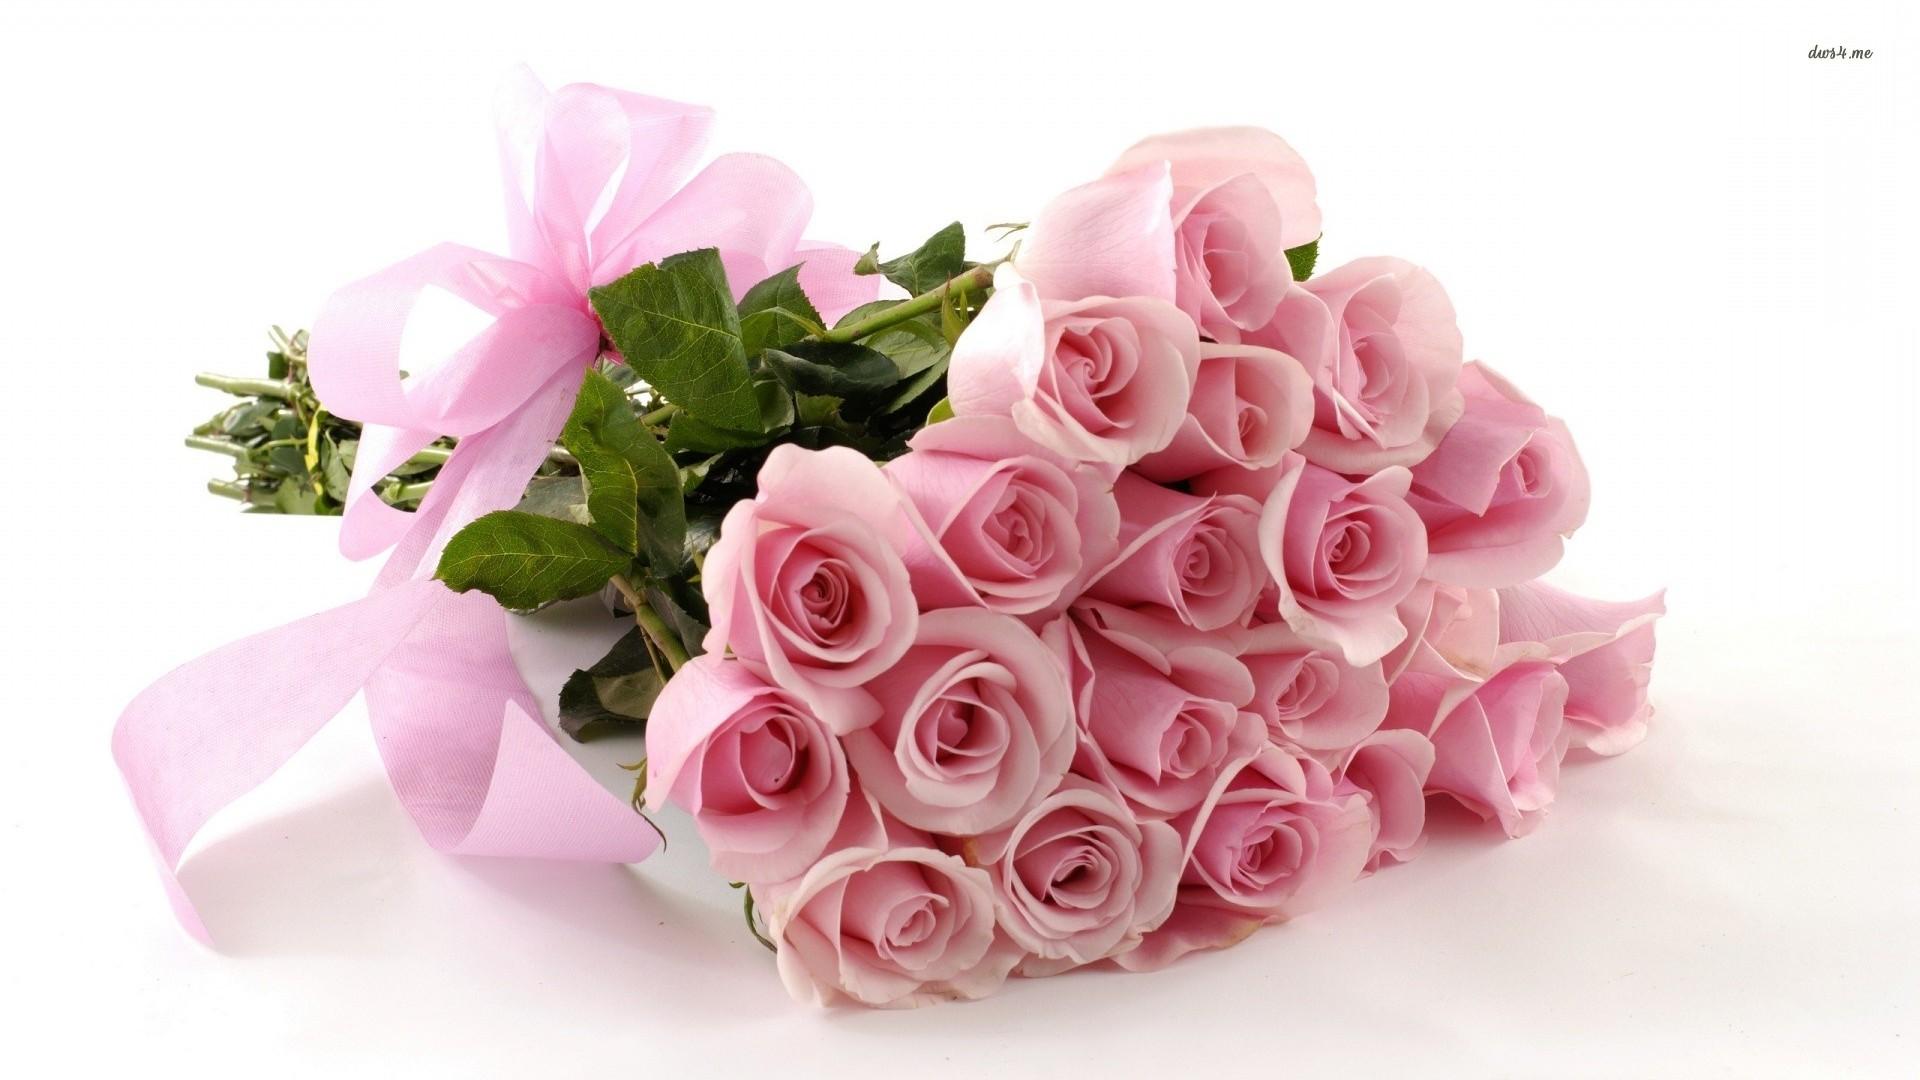 بالصور صور ورد جميل , اجمل صور لبوكيه الورد 4327 10